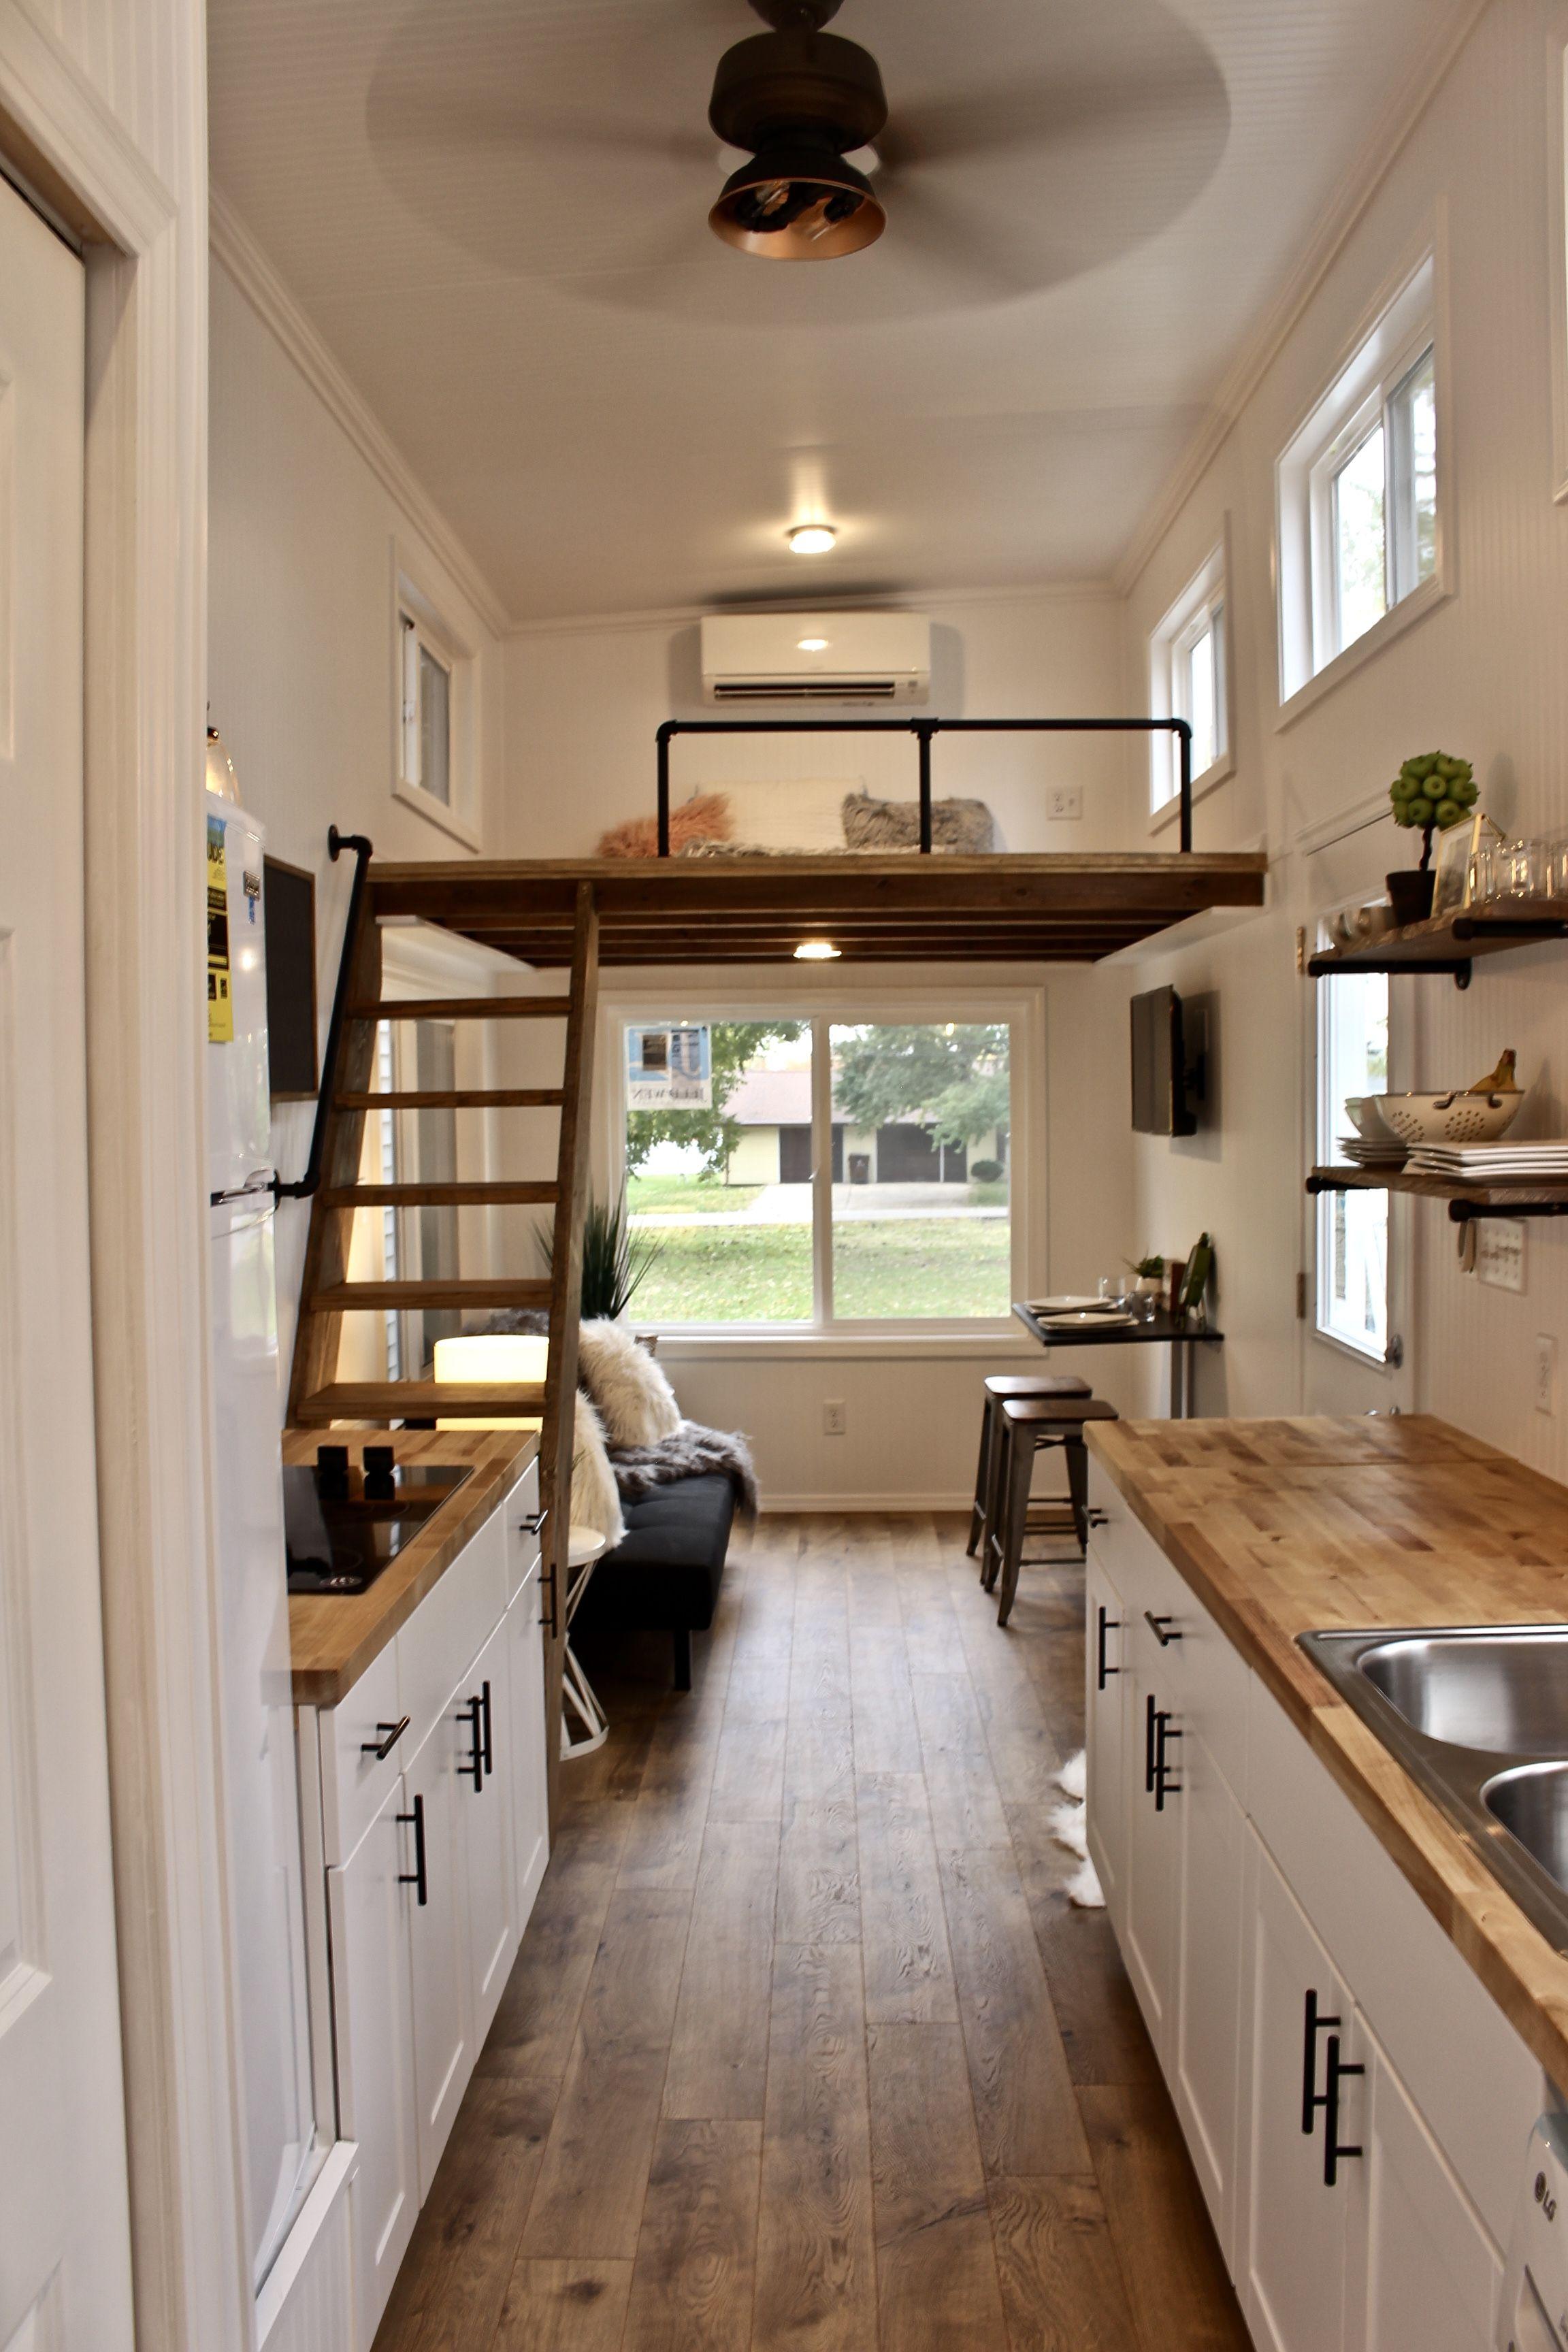 26' Chateau Shack Tiny Home on Wheels #tinyhome